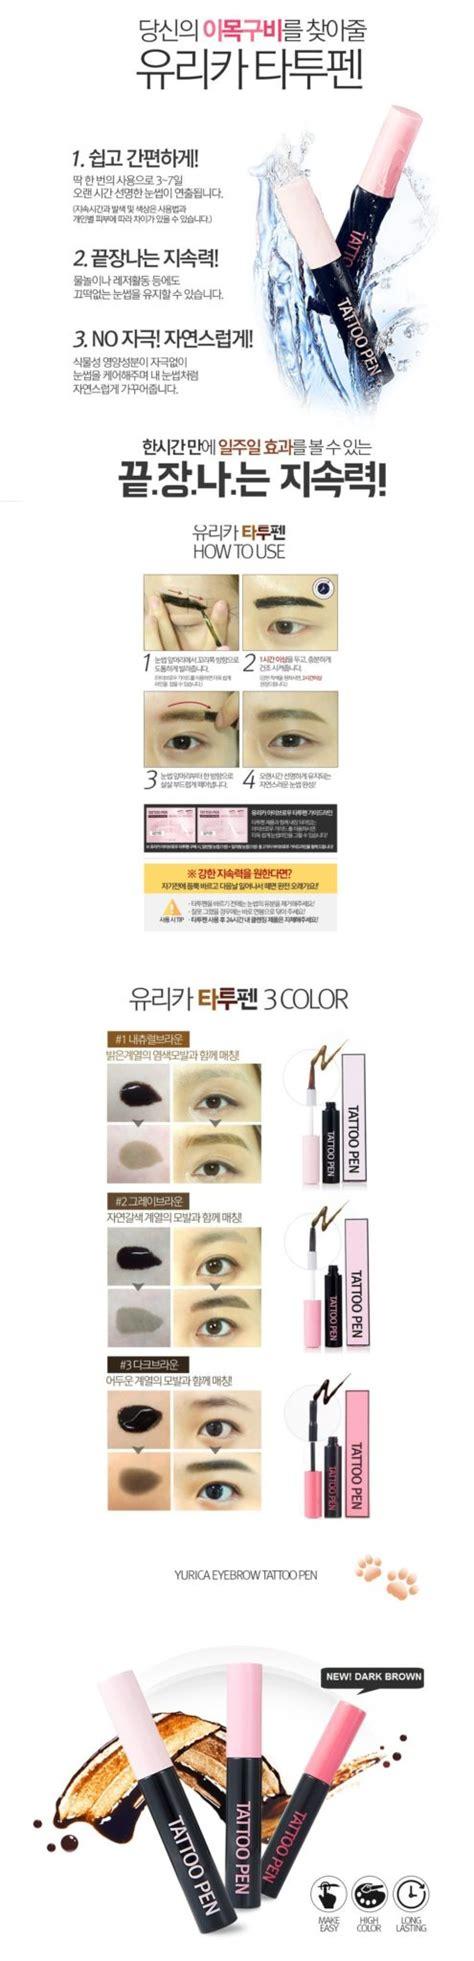 tattoo pen philippines yurica tattoo pen korean cosmetic makeup product online